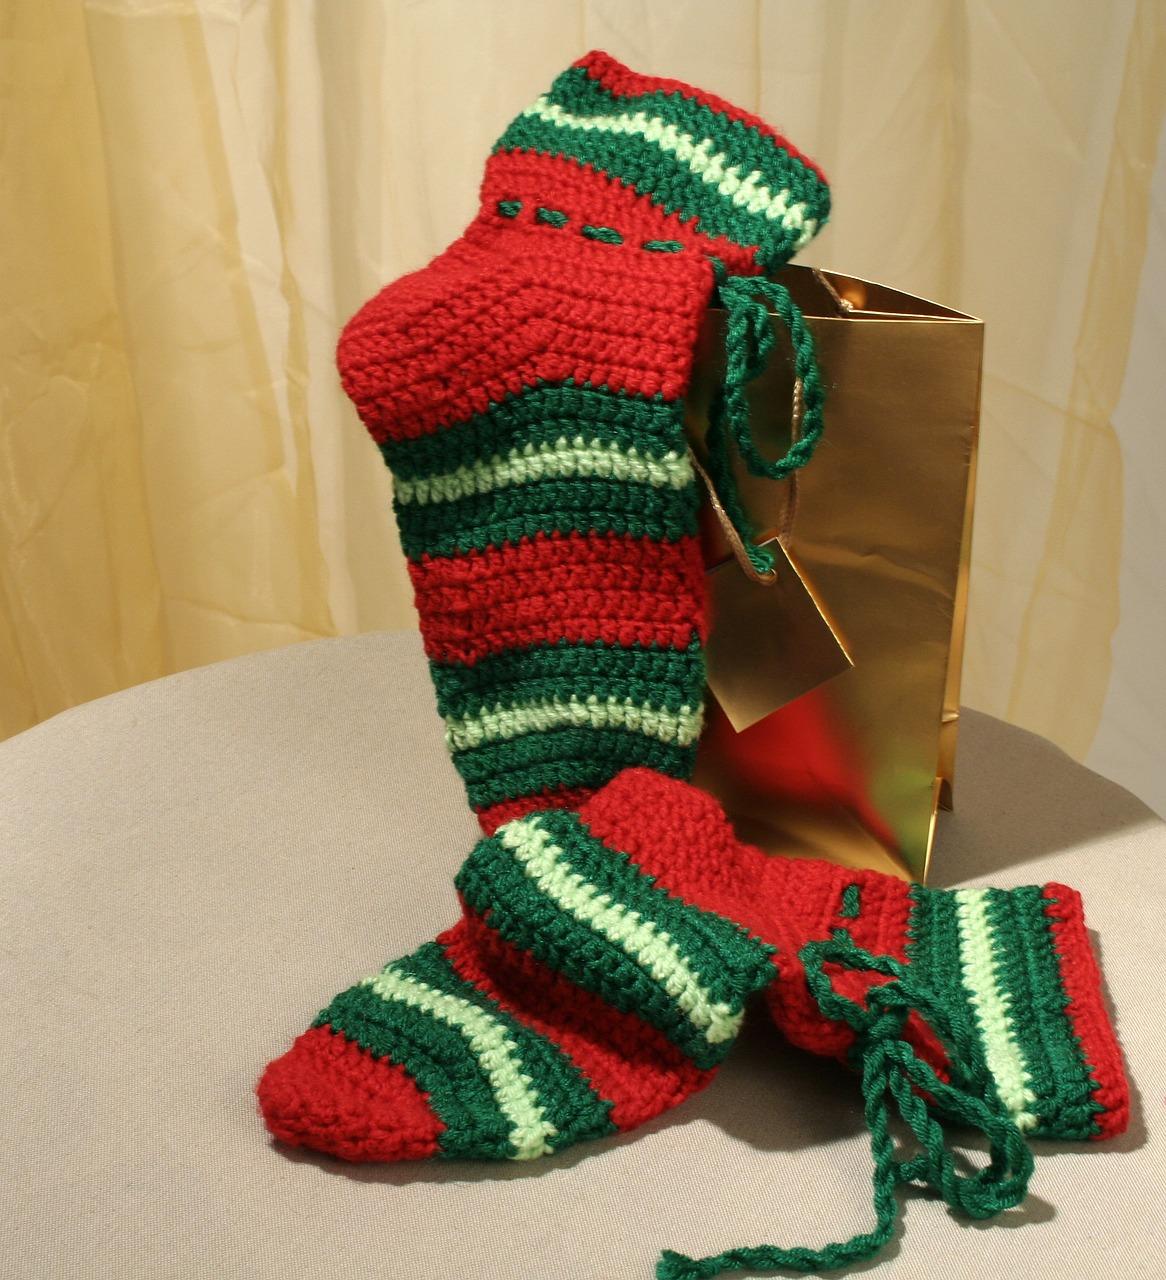 Socks - Free image by Pixabay